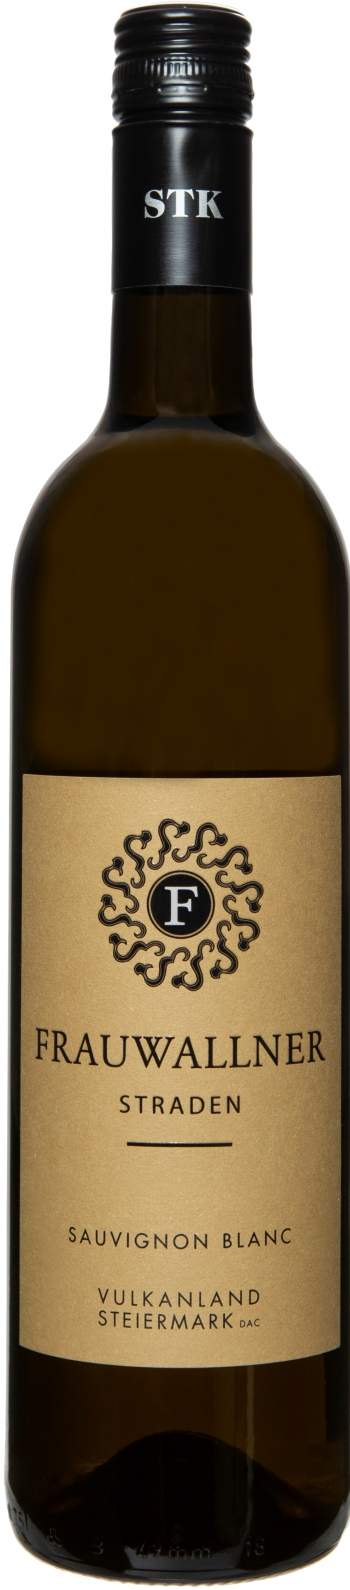 Sauvignon Blanc Vulkanland DAC, Frauwallner 2018